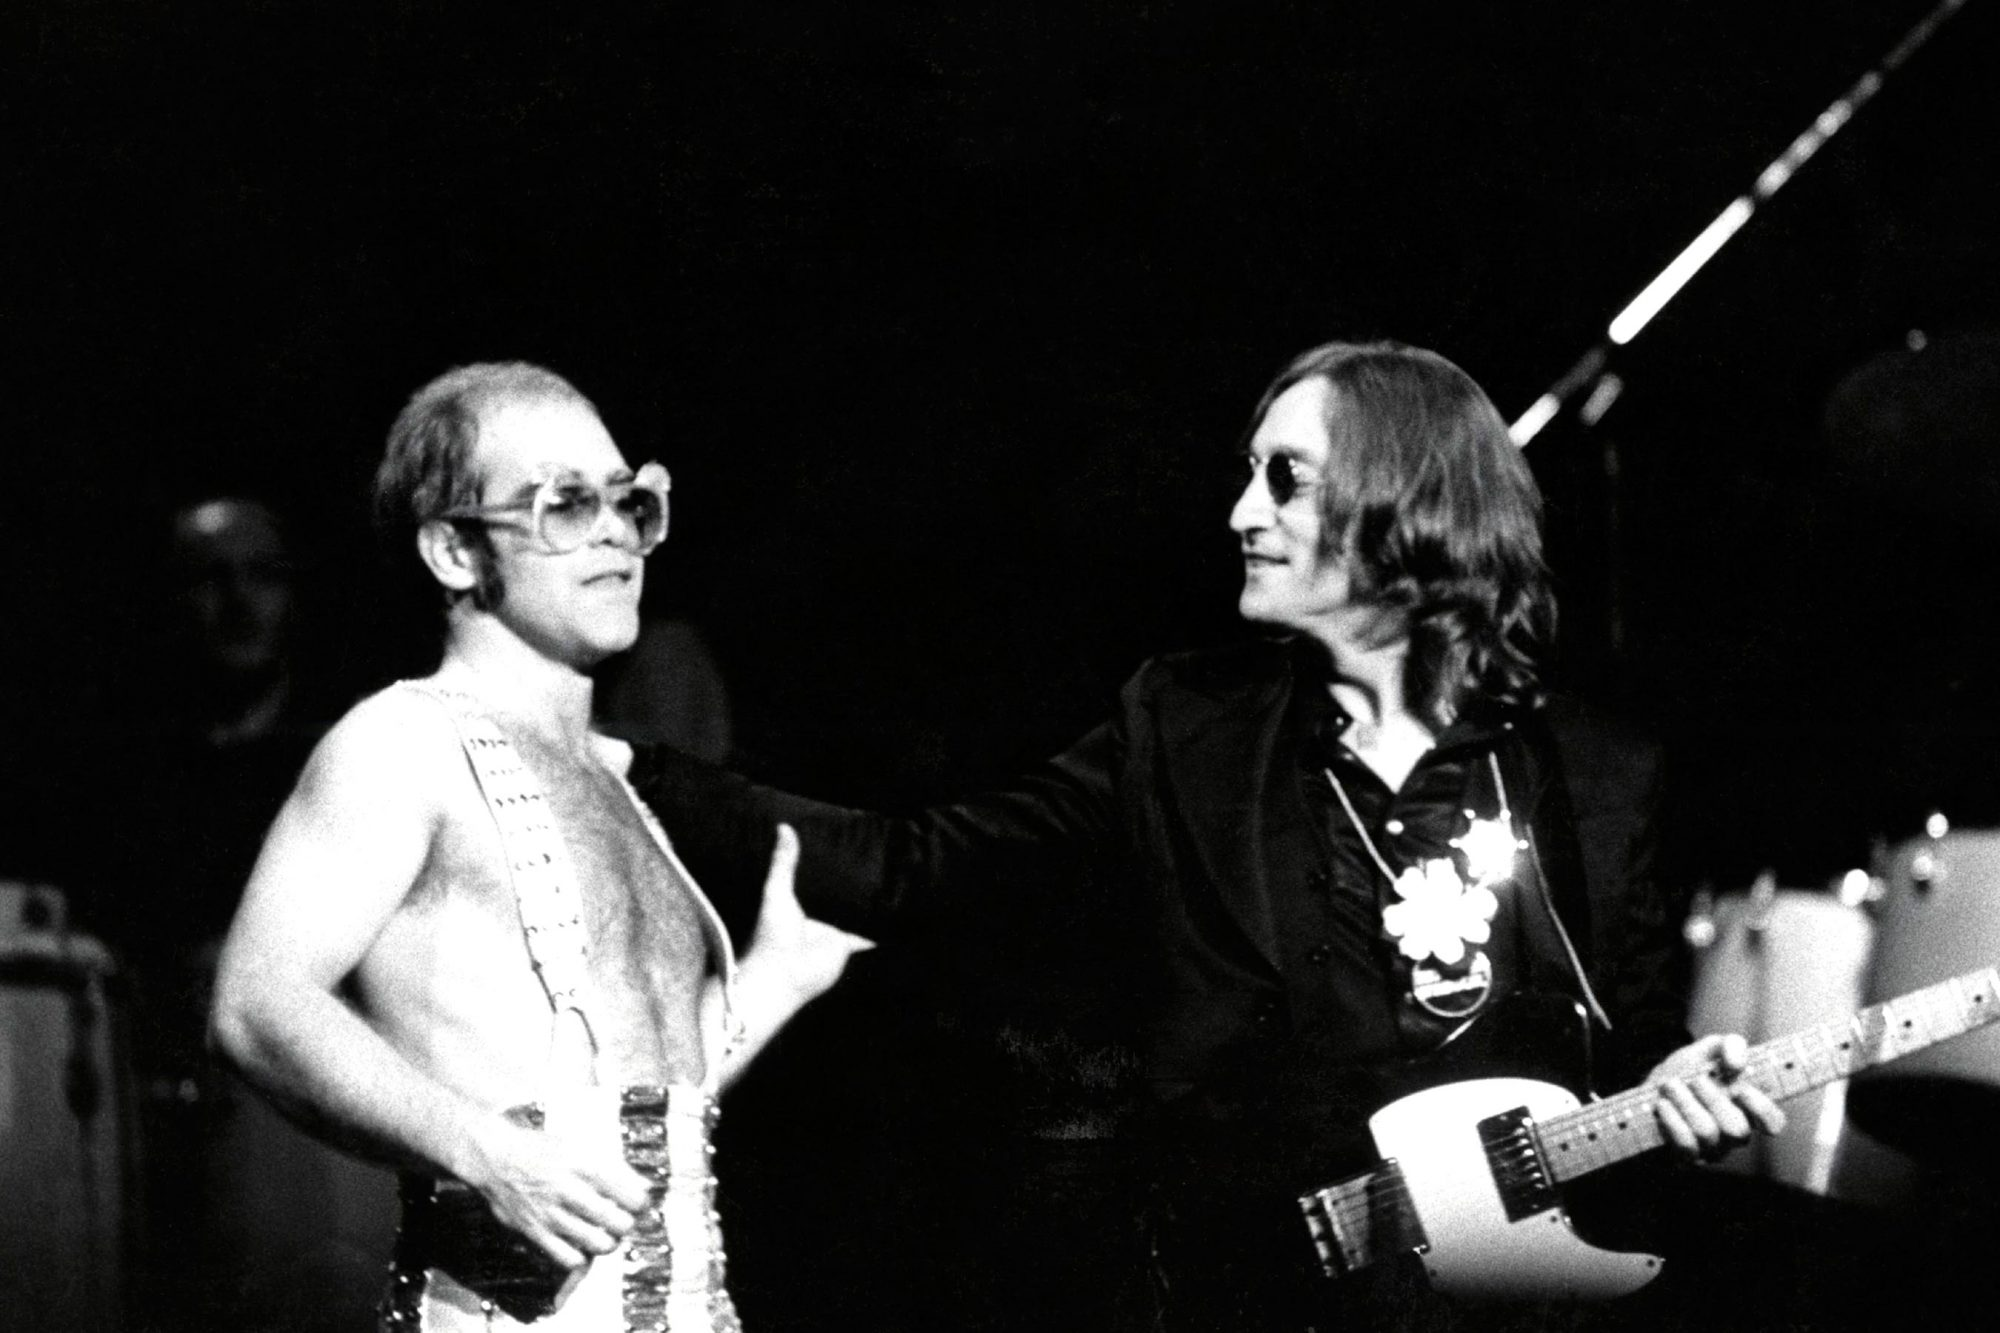 Photo of Elton JOHN and John LENNON